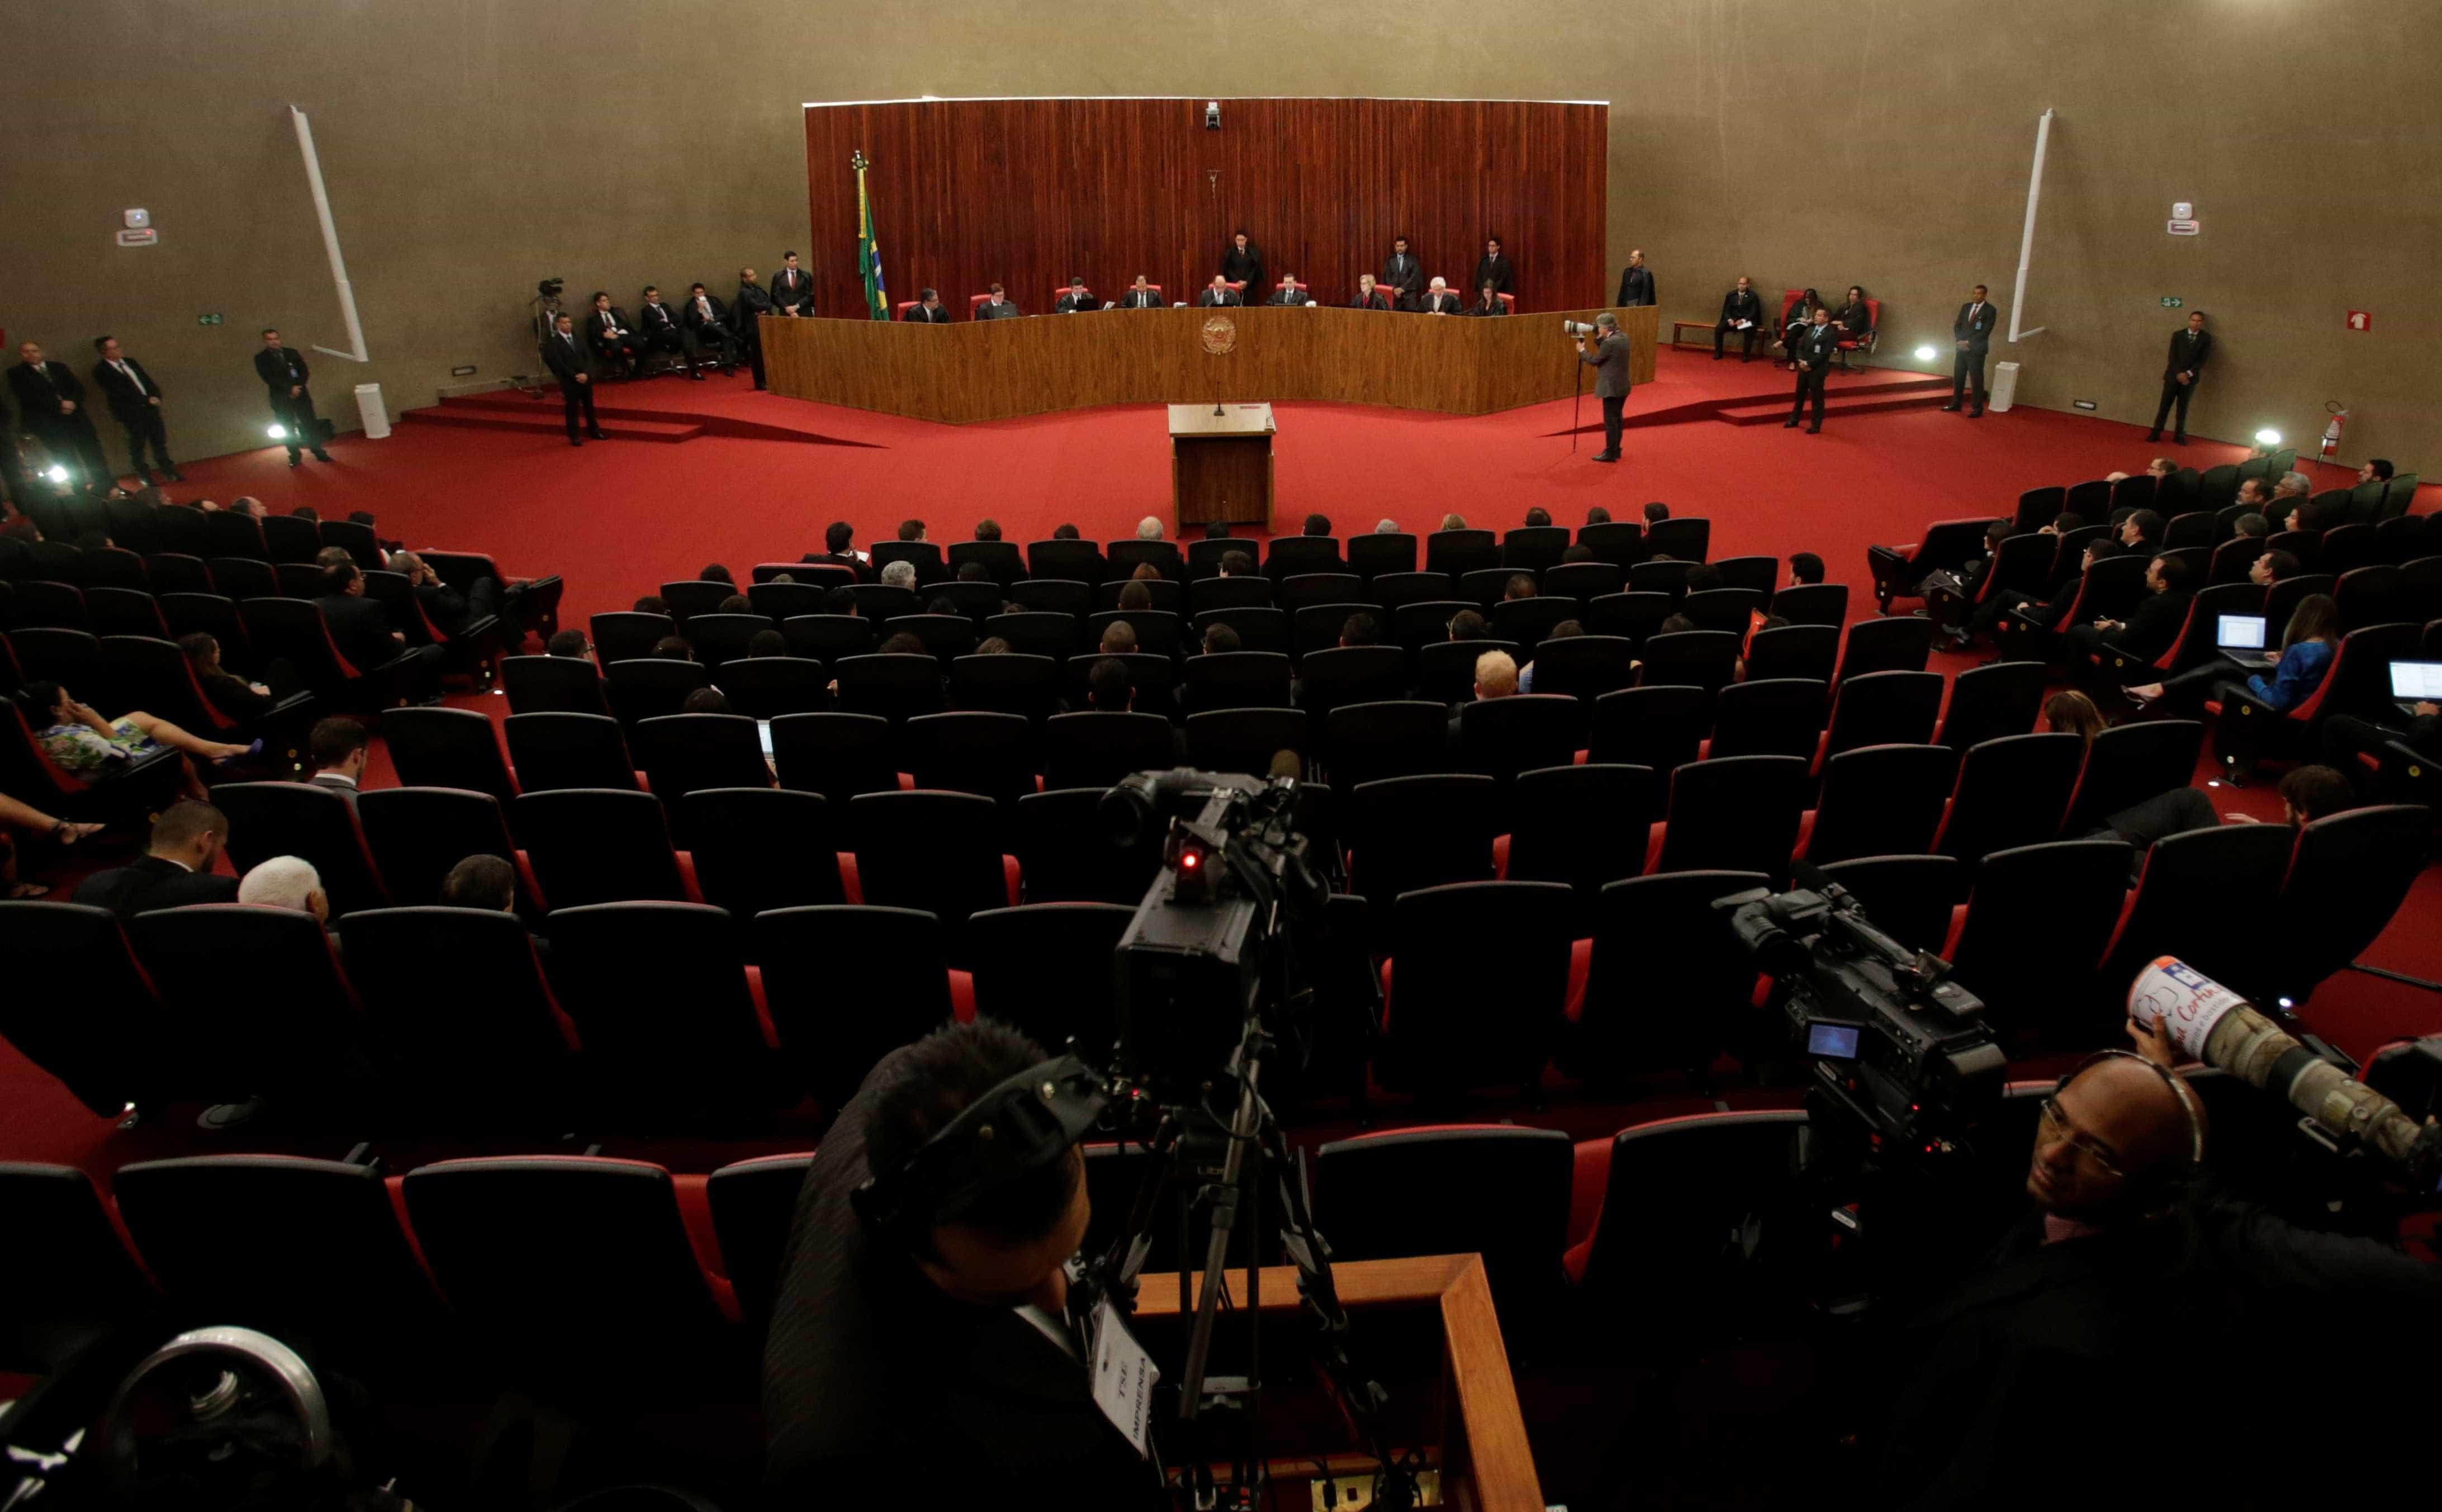 Saiba o que pensam os ministros do TSE sobre a Lei da Ficha Limpa